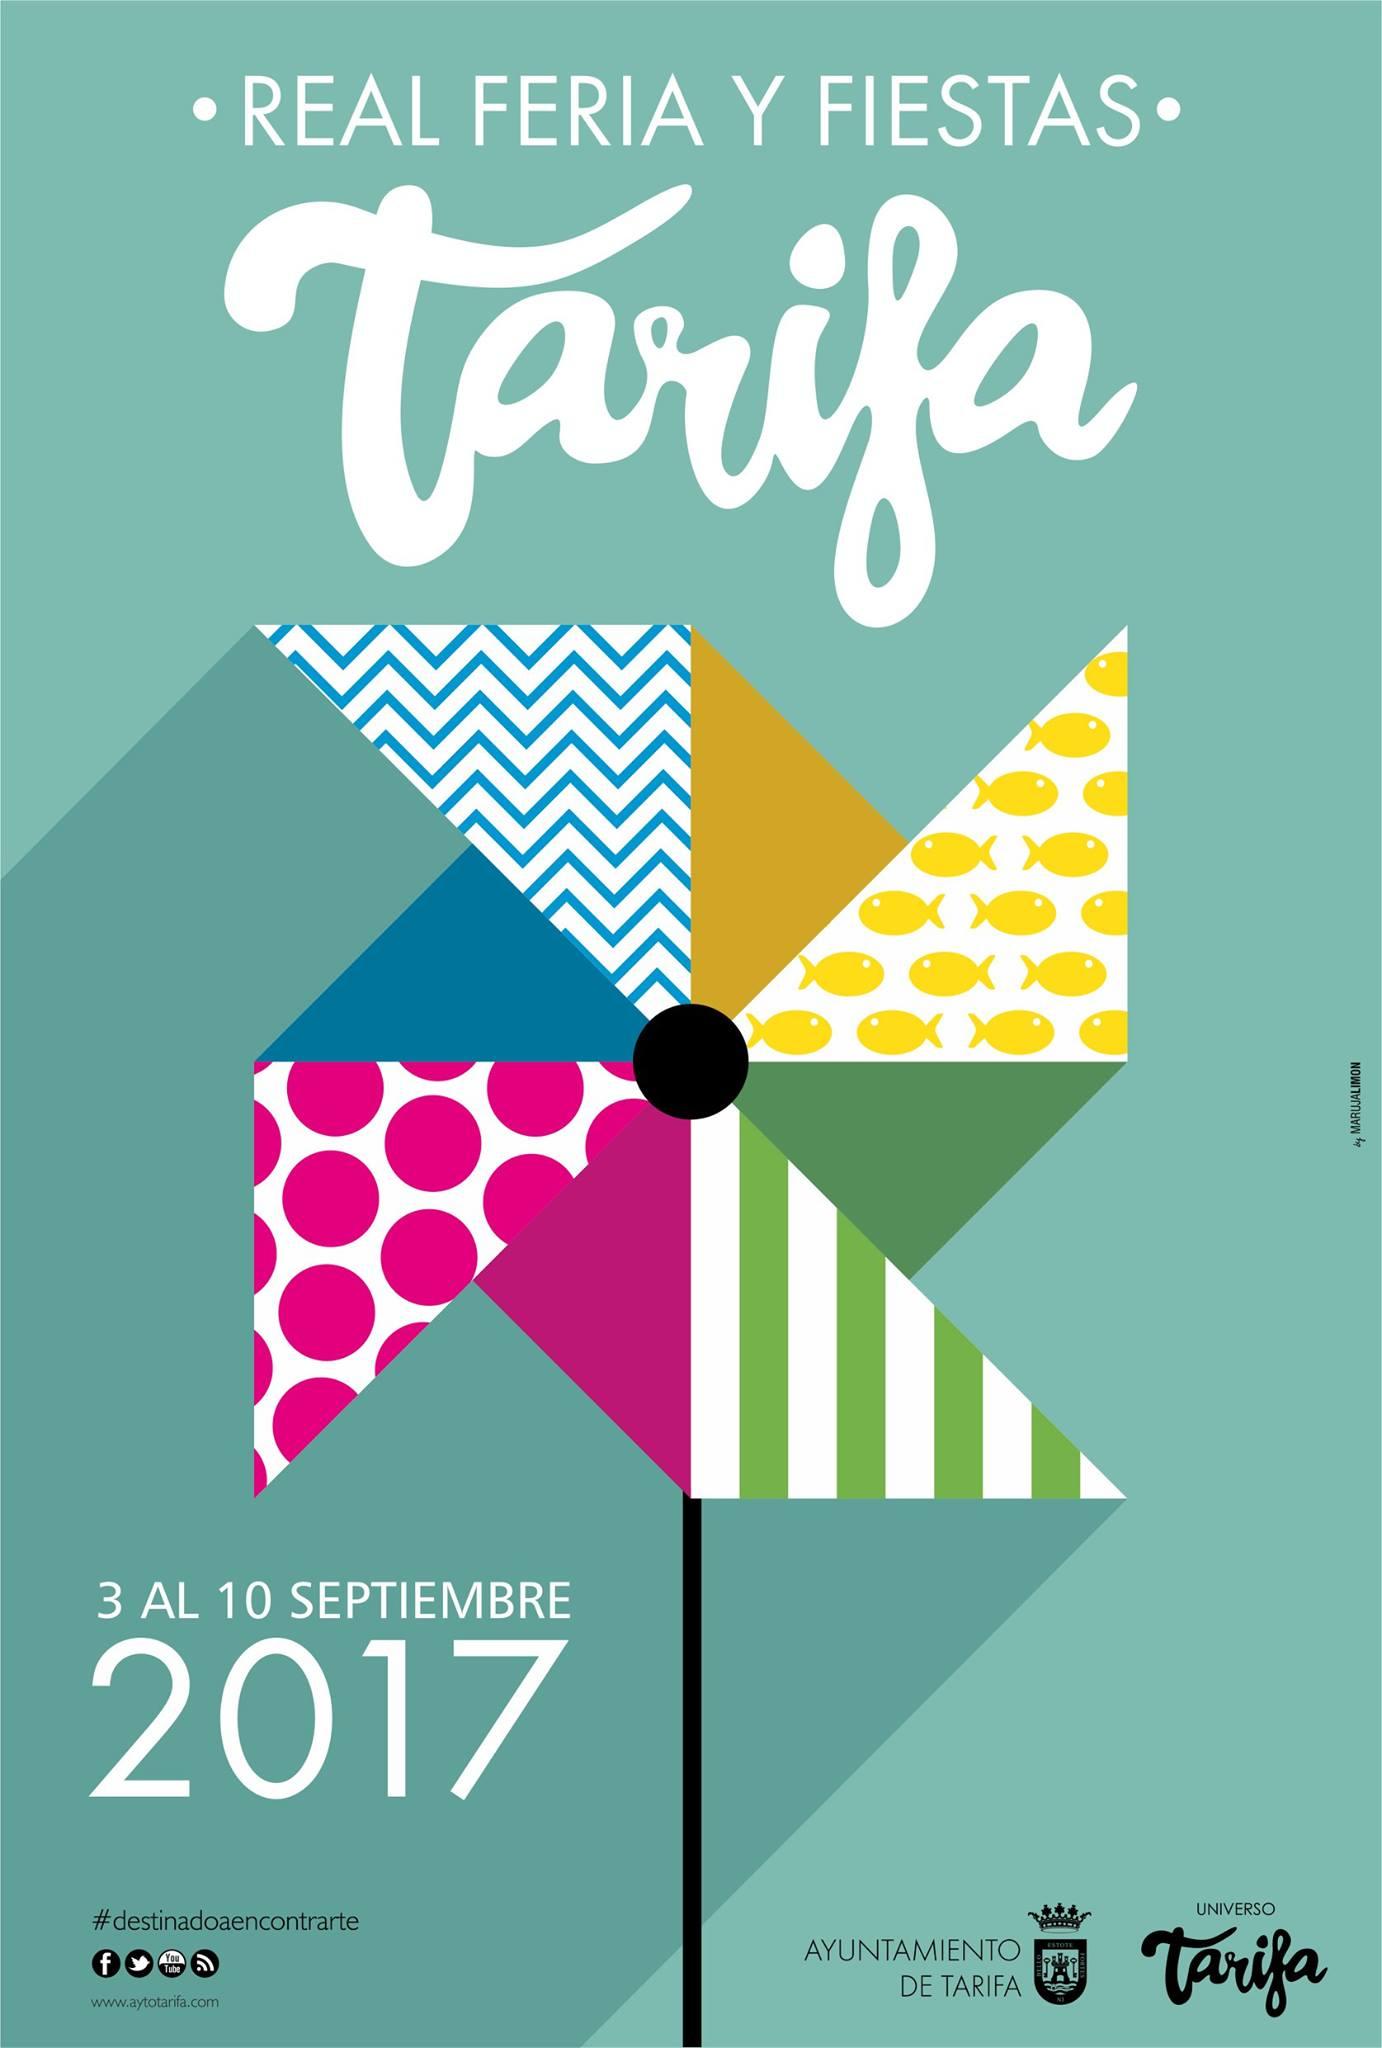 Feria de Tarifa 2017